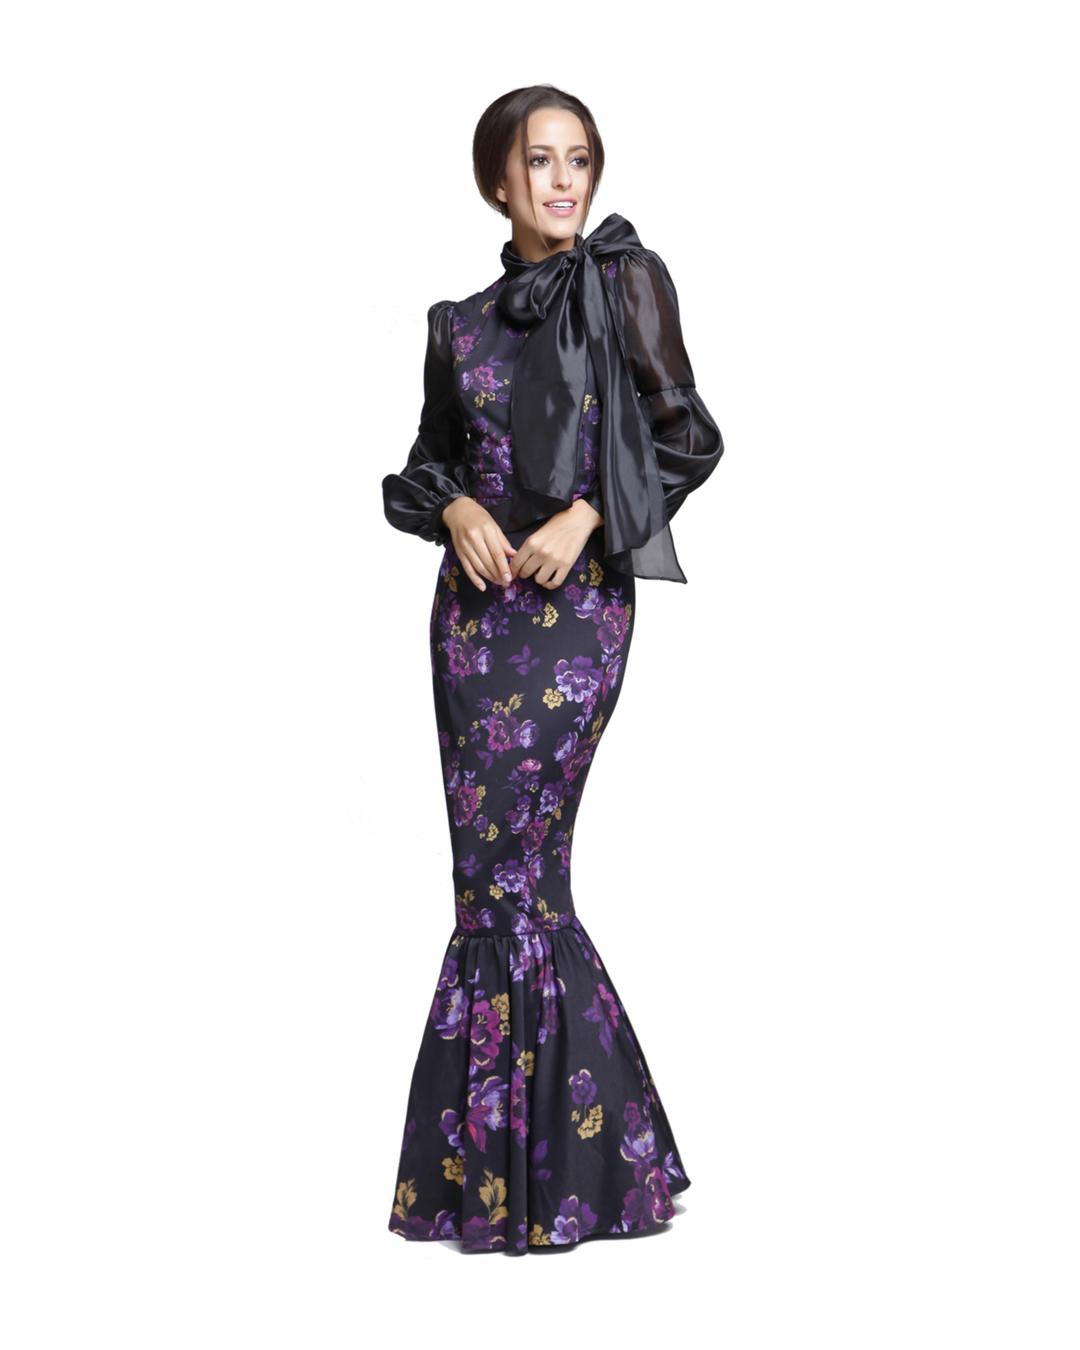 d77f45be1 مع فستان سهرة طويل مطبّع بالورود من فيمي 9 وهو بسعر 260 ريال سعودي